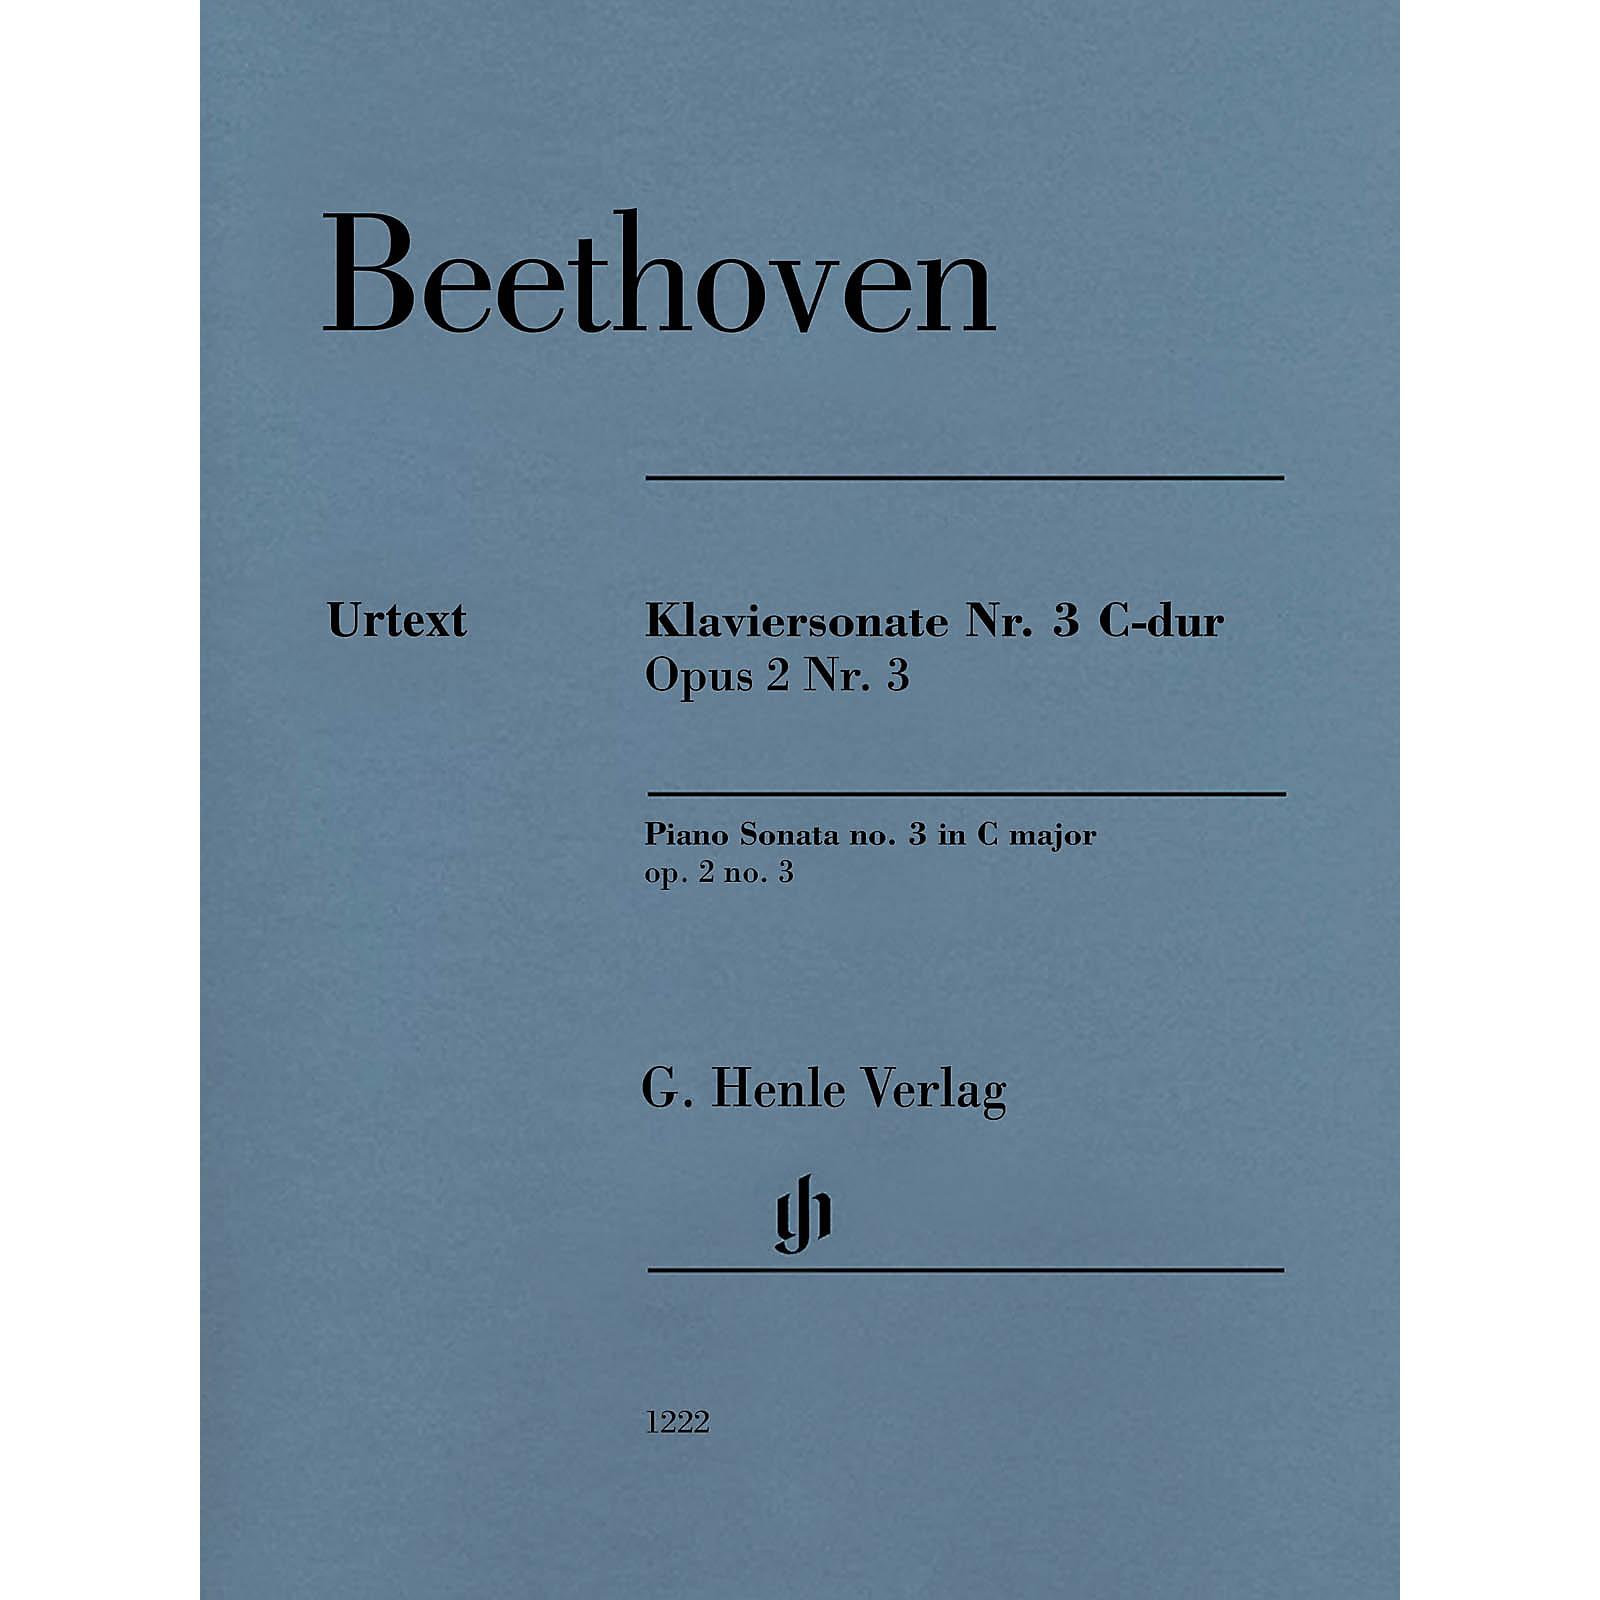 G. Henle Verlag Piano Sonata No. 3 C Major (Op. 2 No.3) for Piano Solo - Henle Music